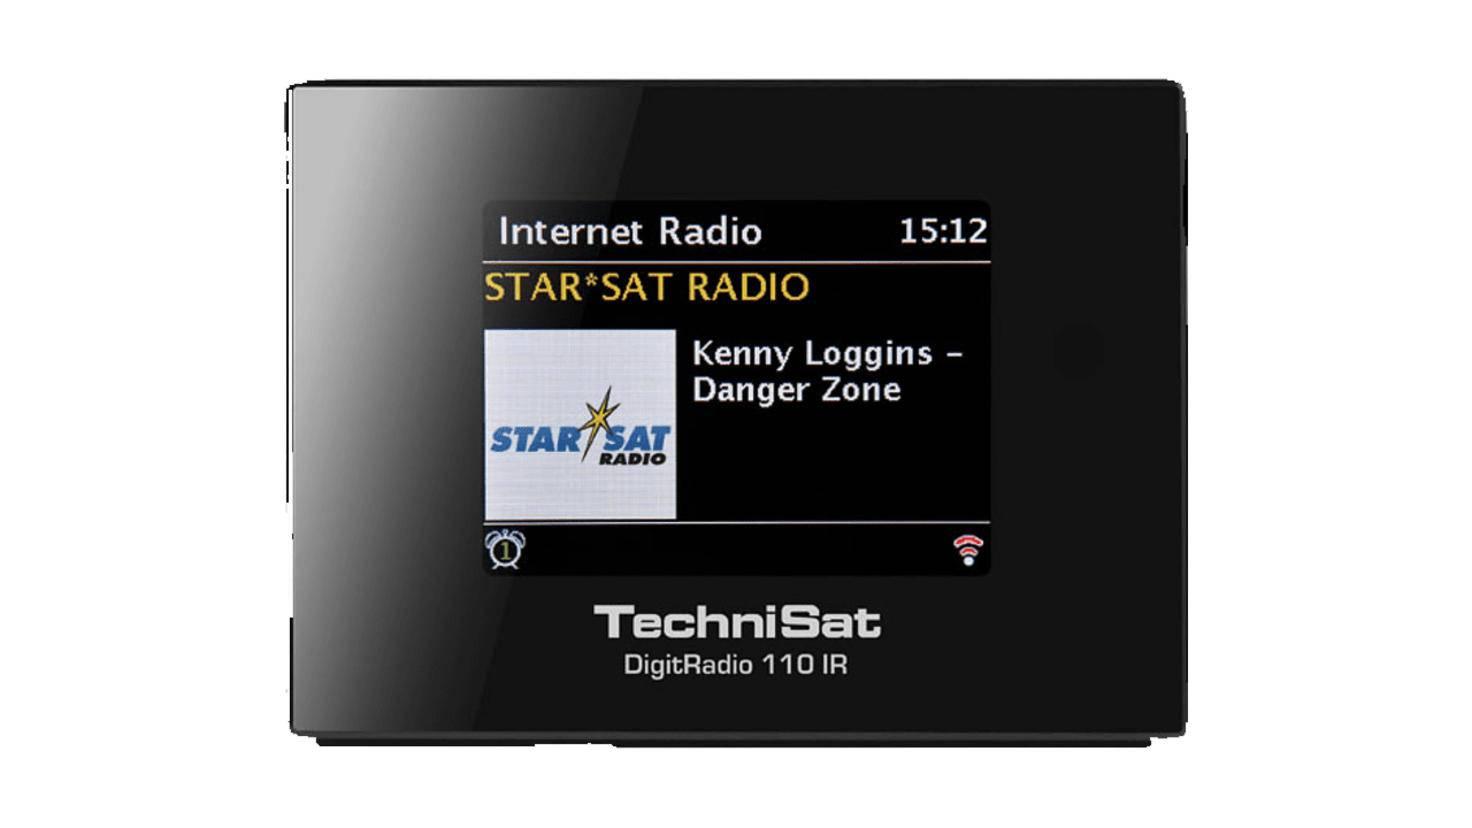 TechniSat Digitradio 110 IR Internetradio